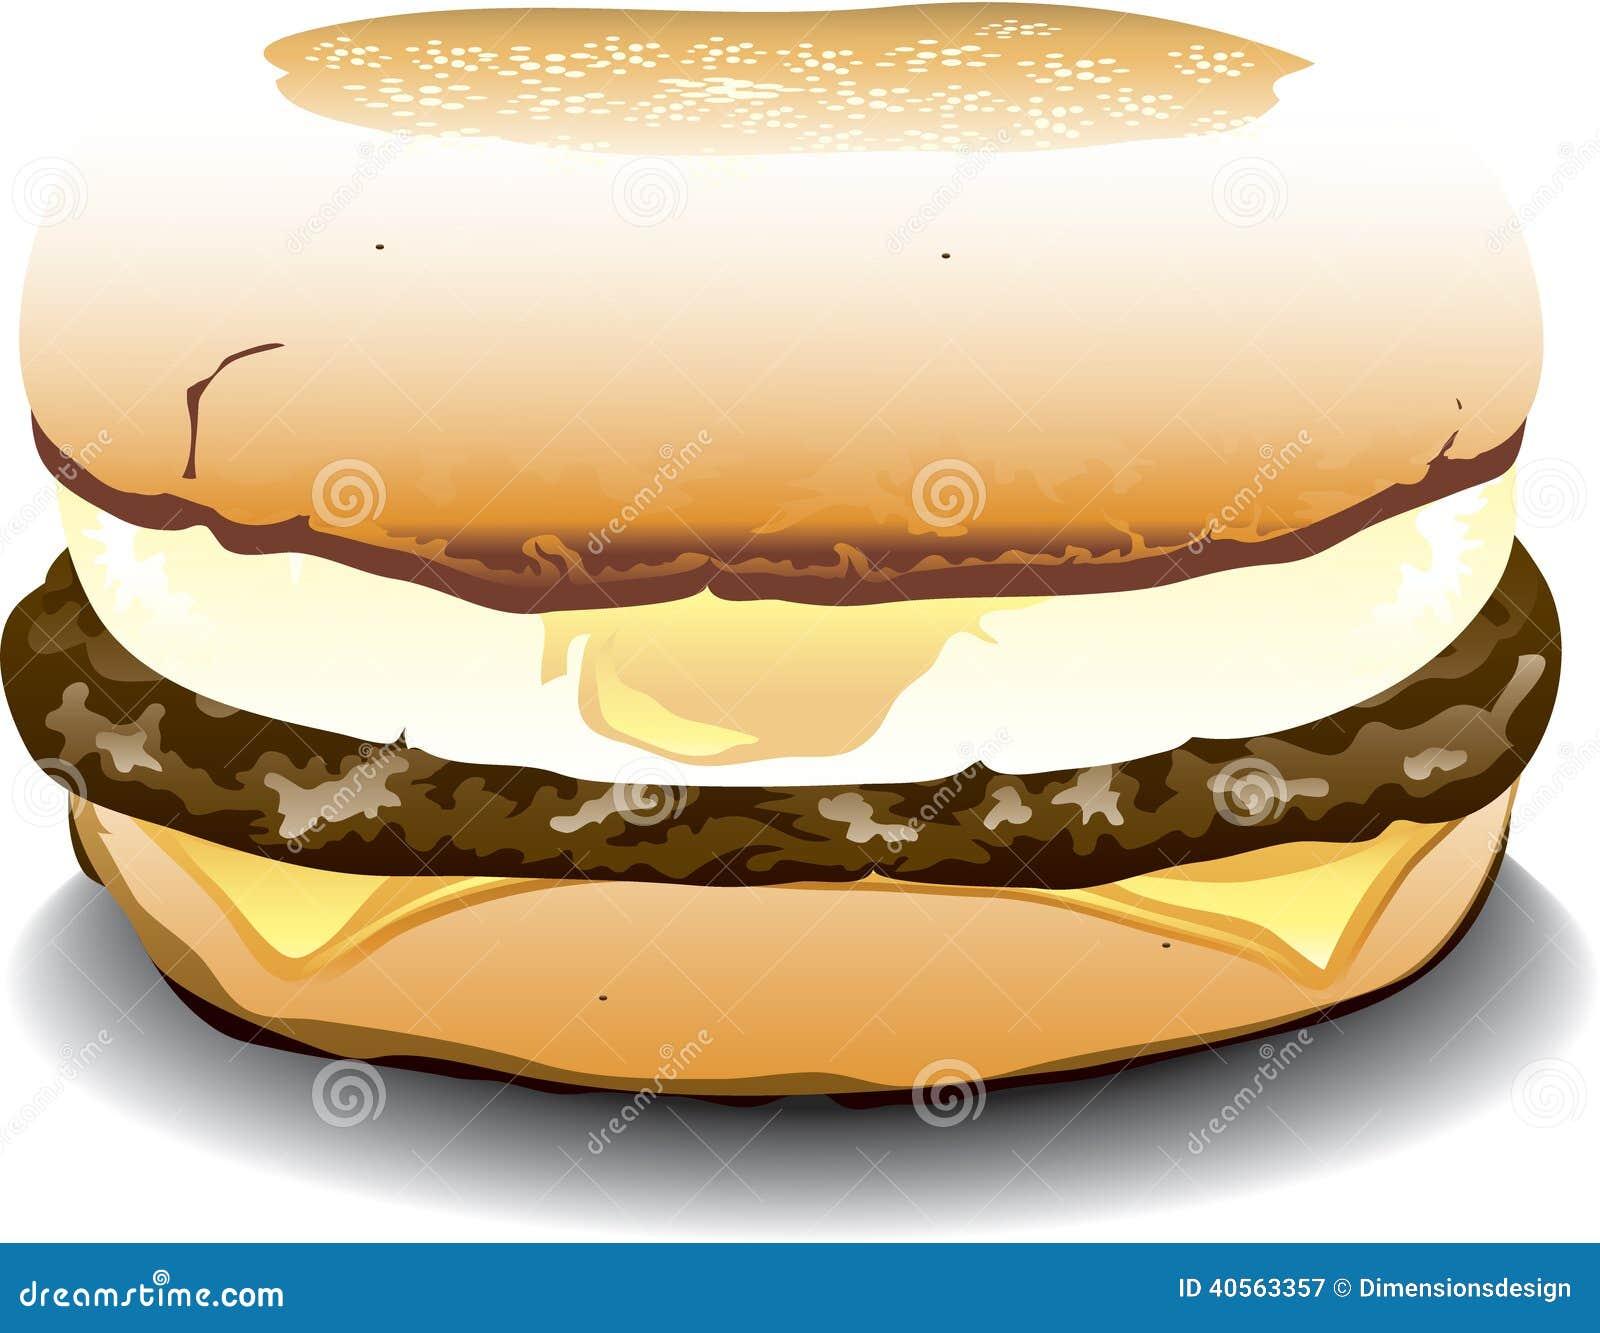 английские булочки с сыром